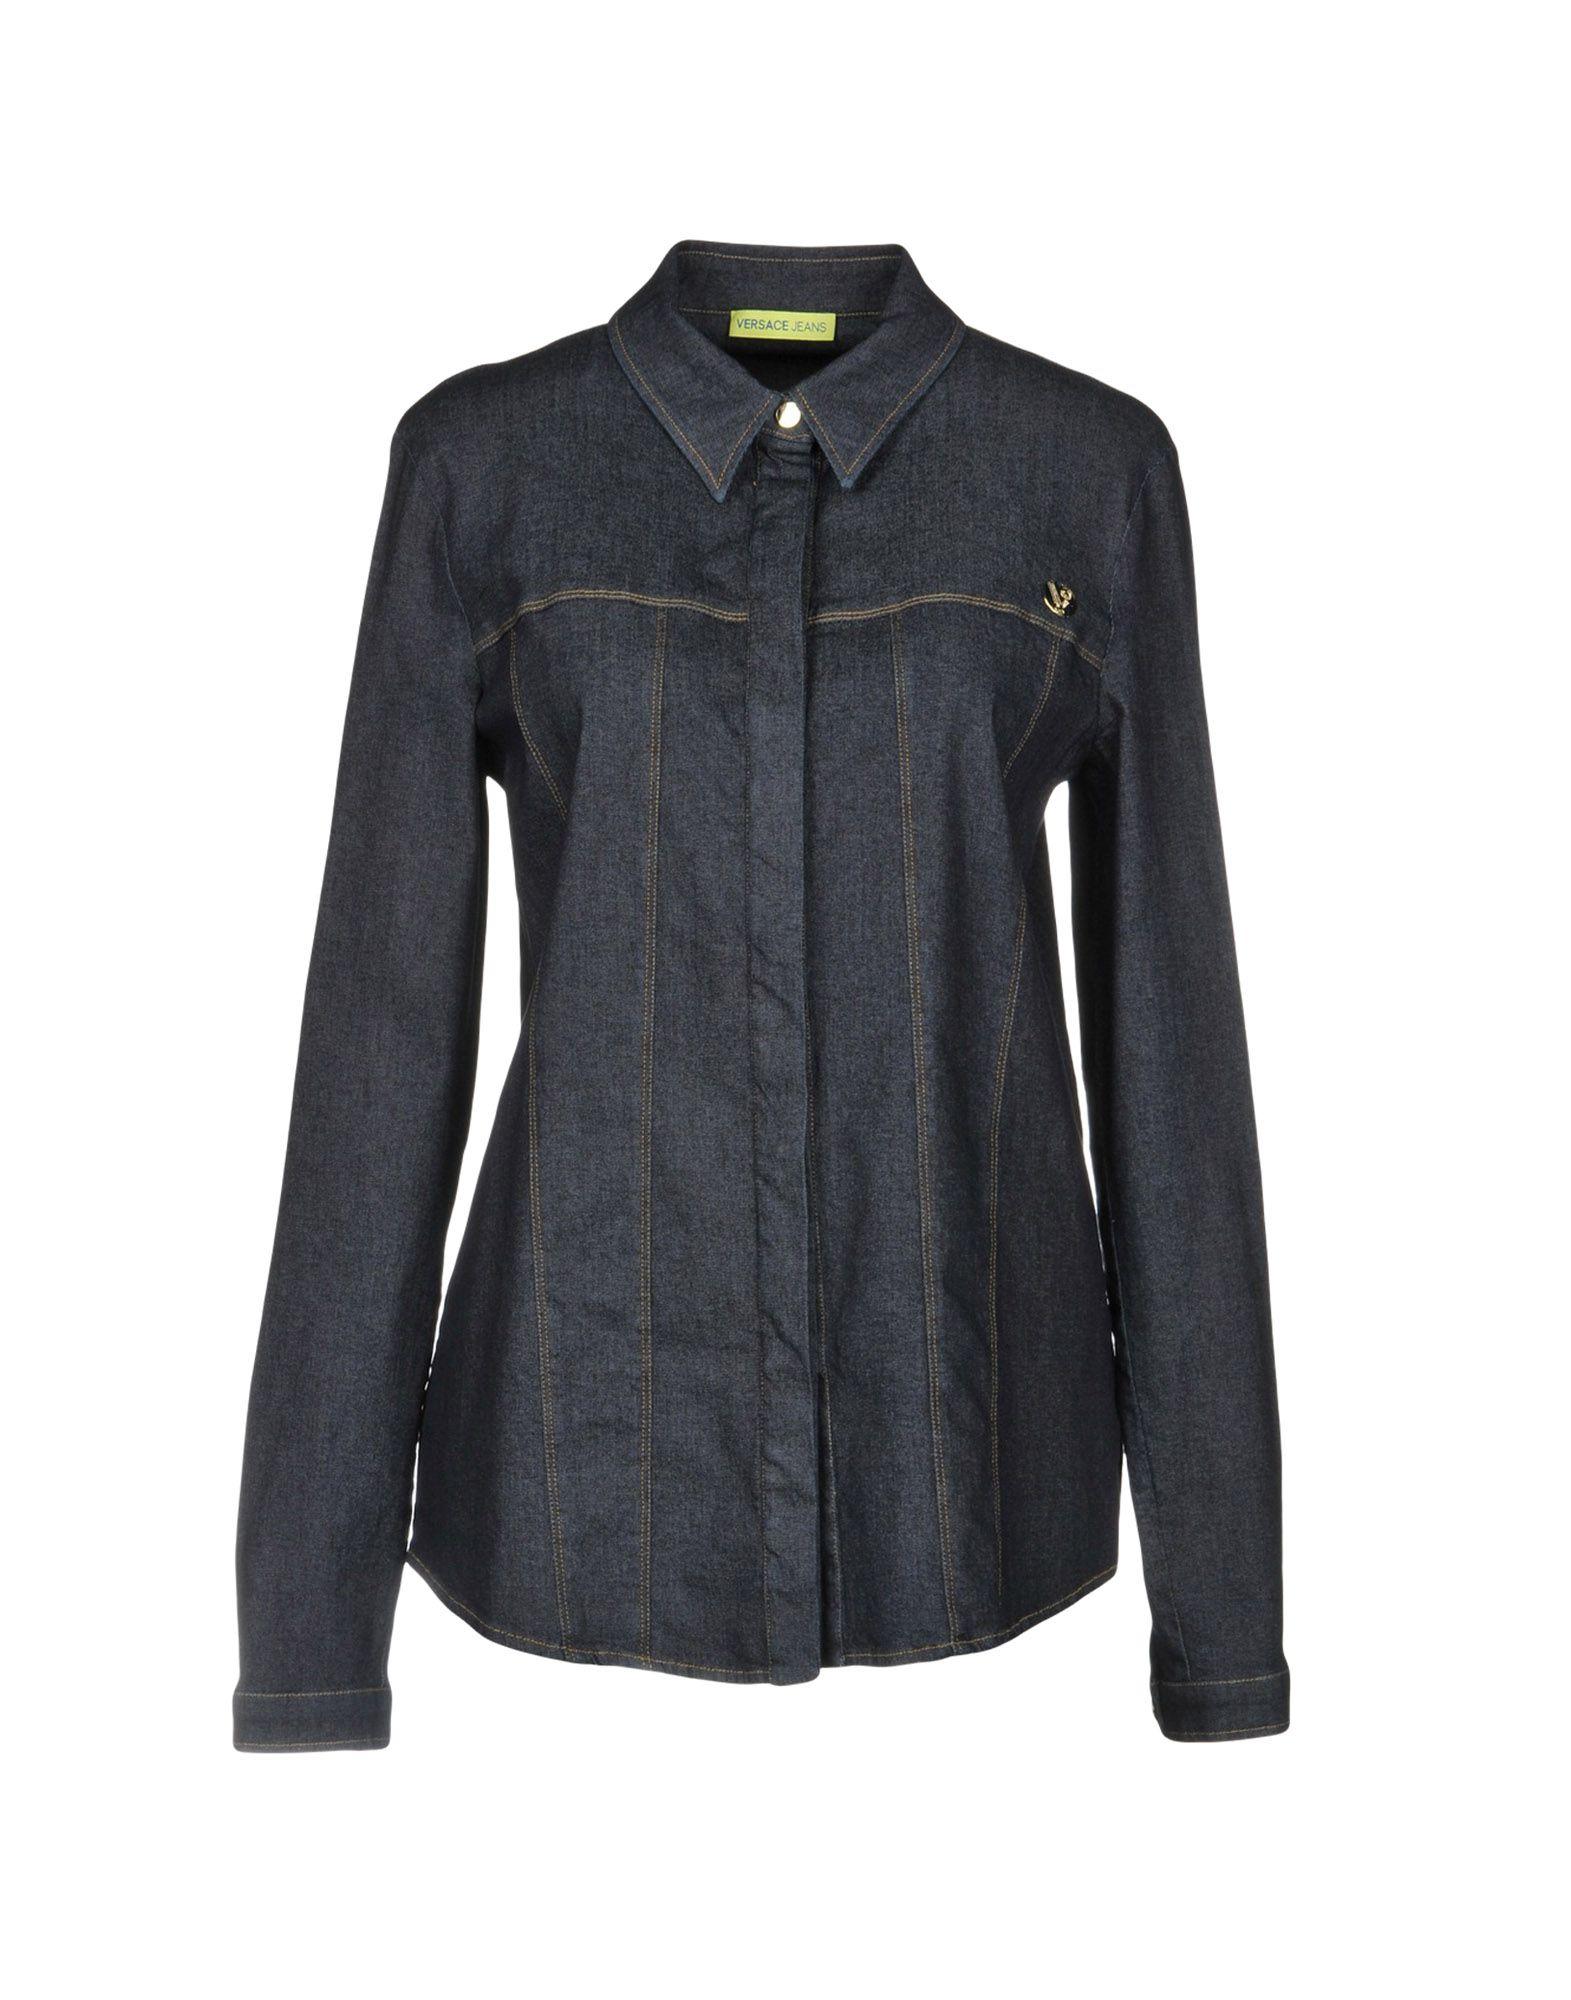 Versace Jeans DENIM SHIRTS